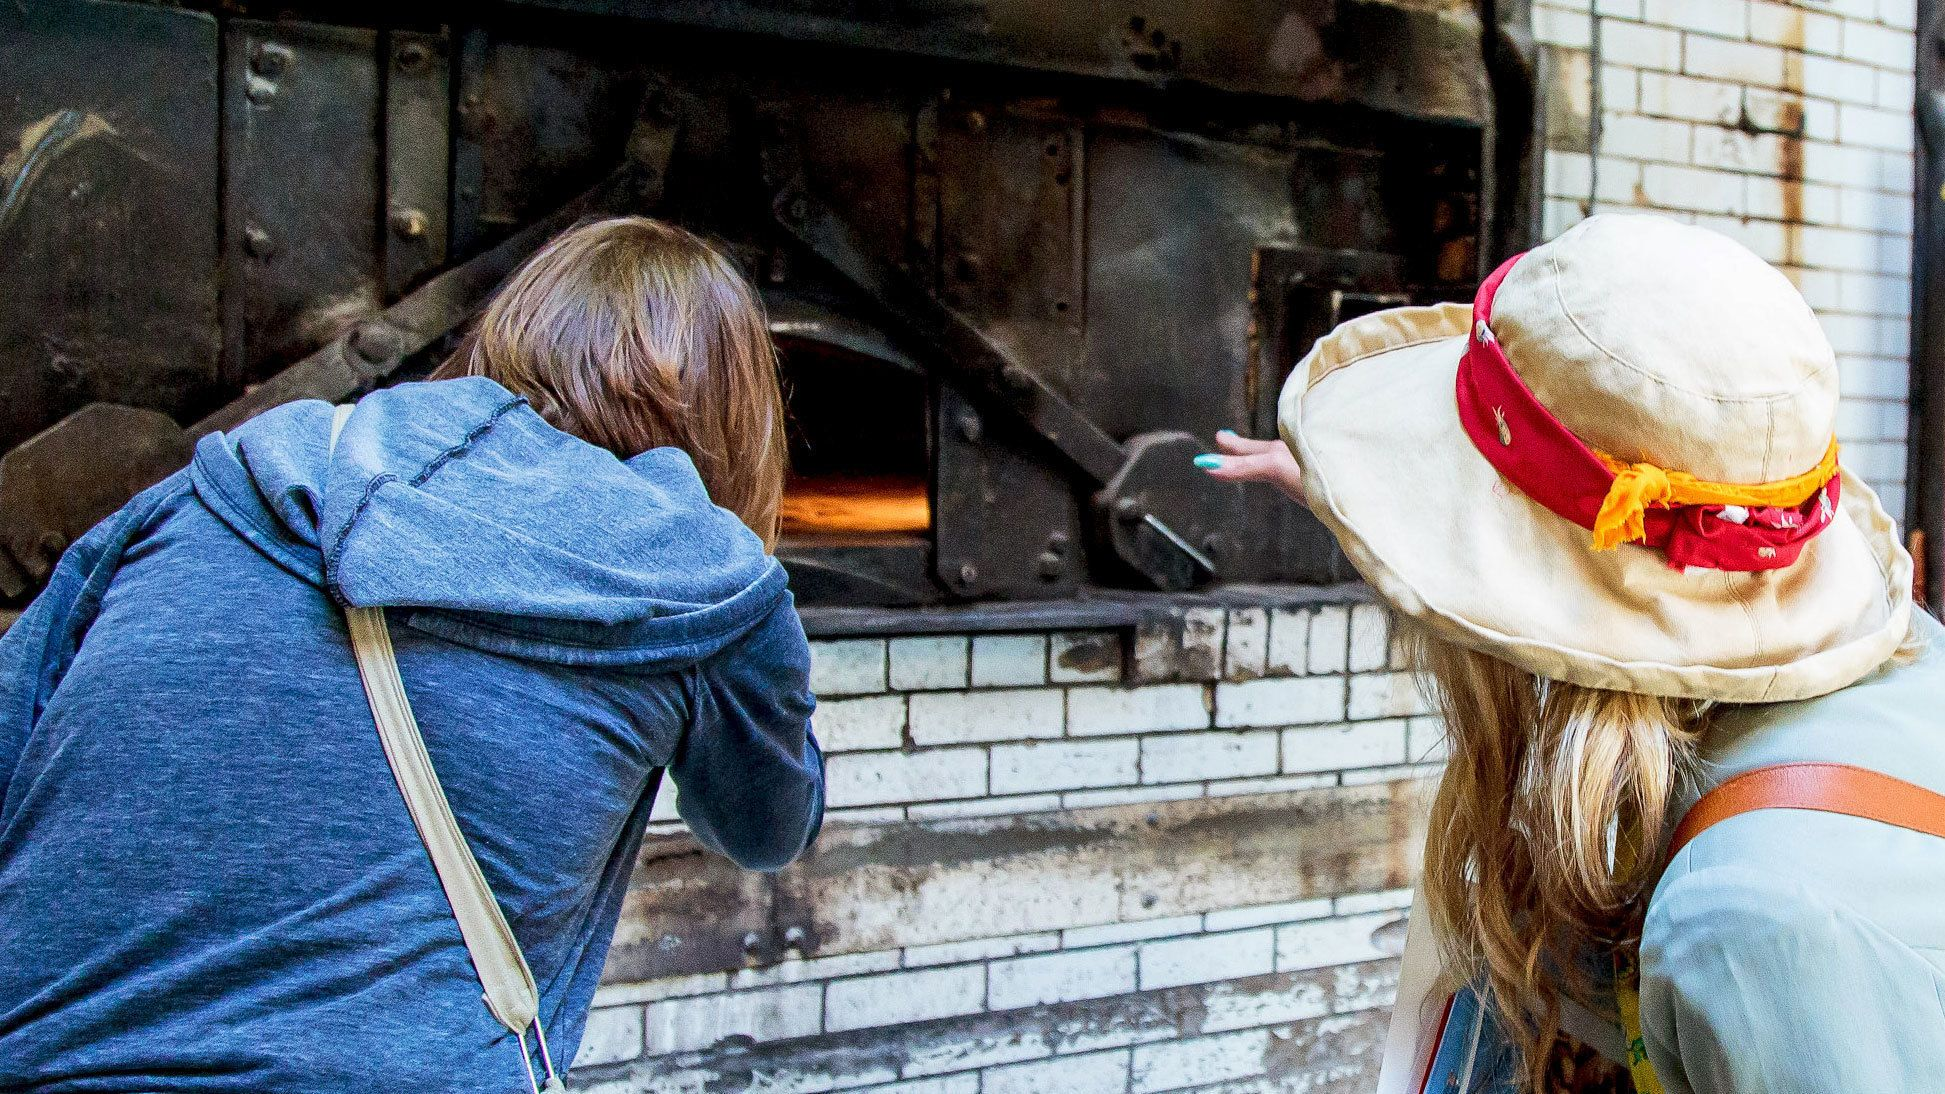 Women looking in pizza oven in San Francisco